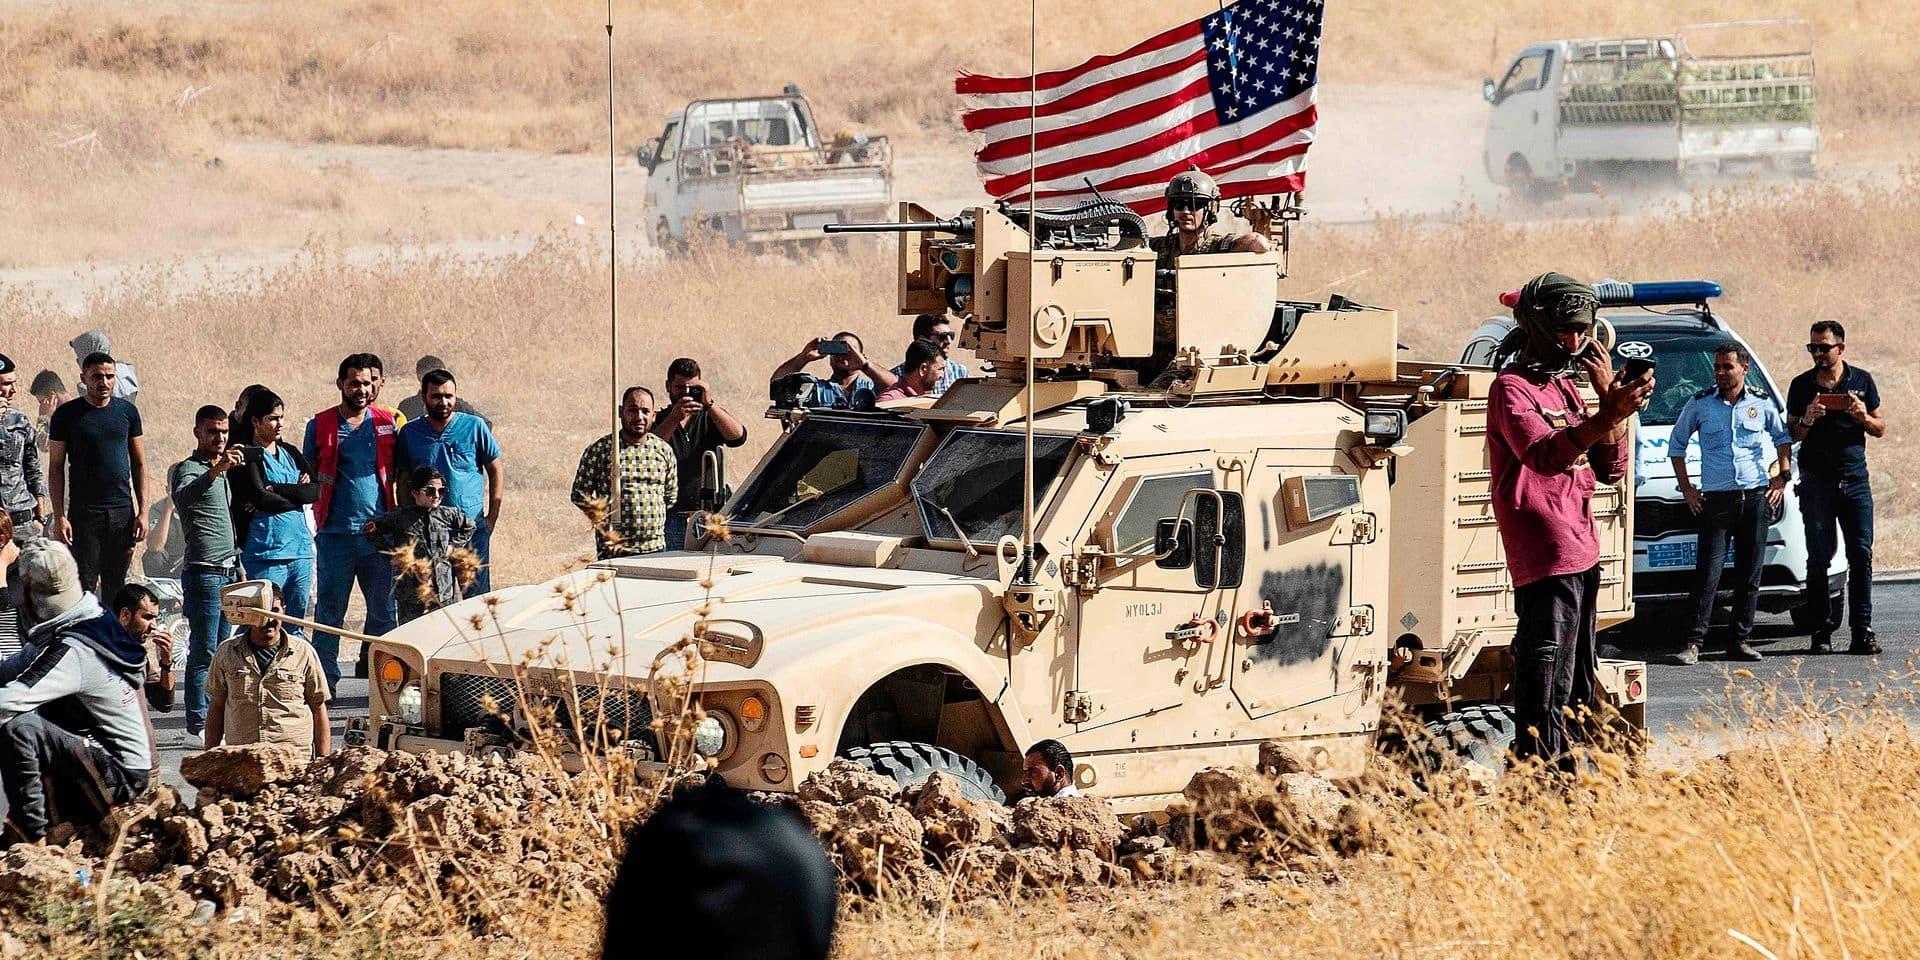 Les djihadistes européens, le sujet qui irrite Donald Trump